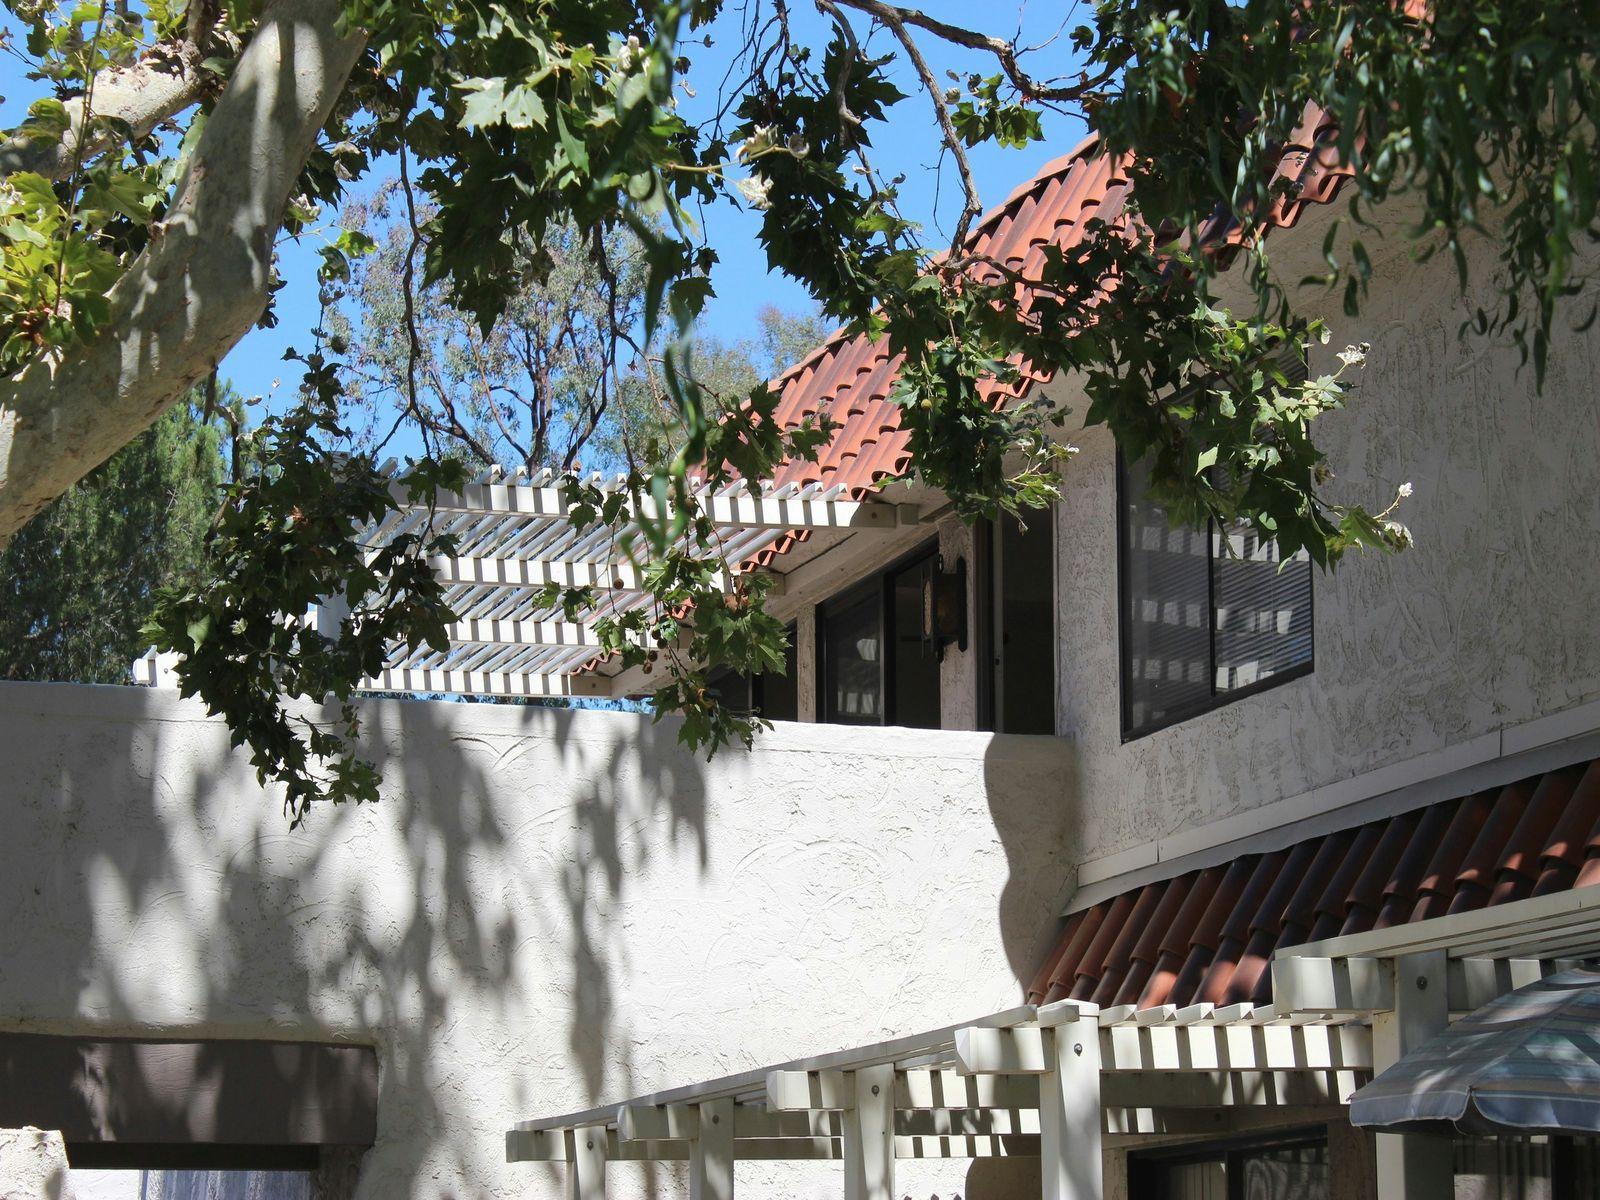 Penthouse Condo in Westlake Village